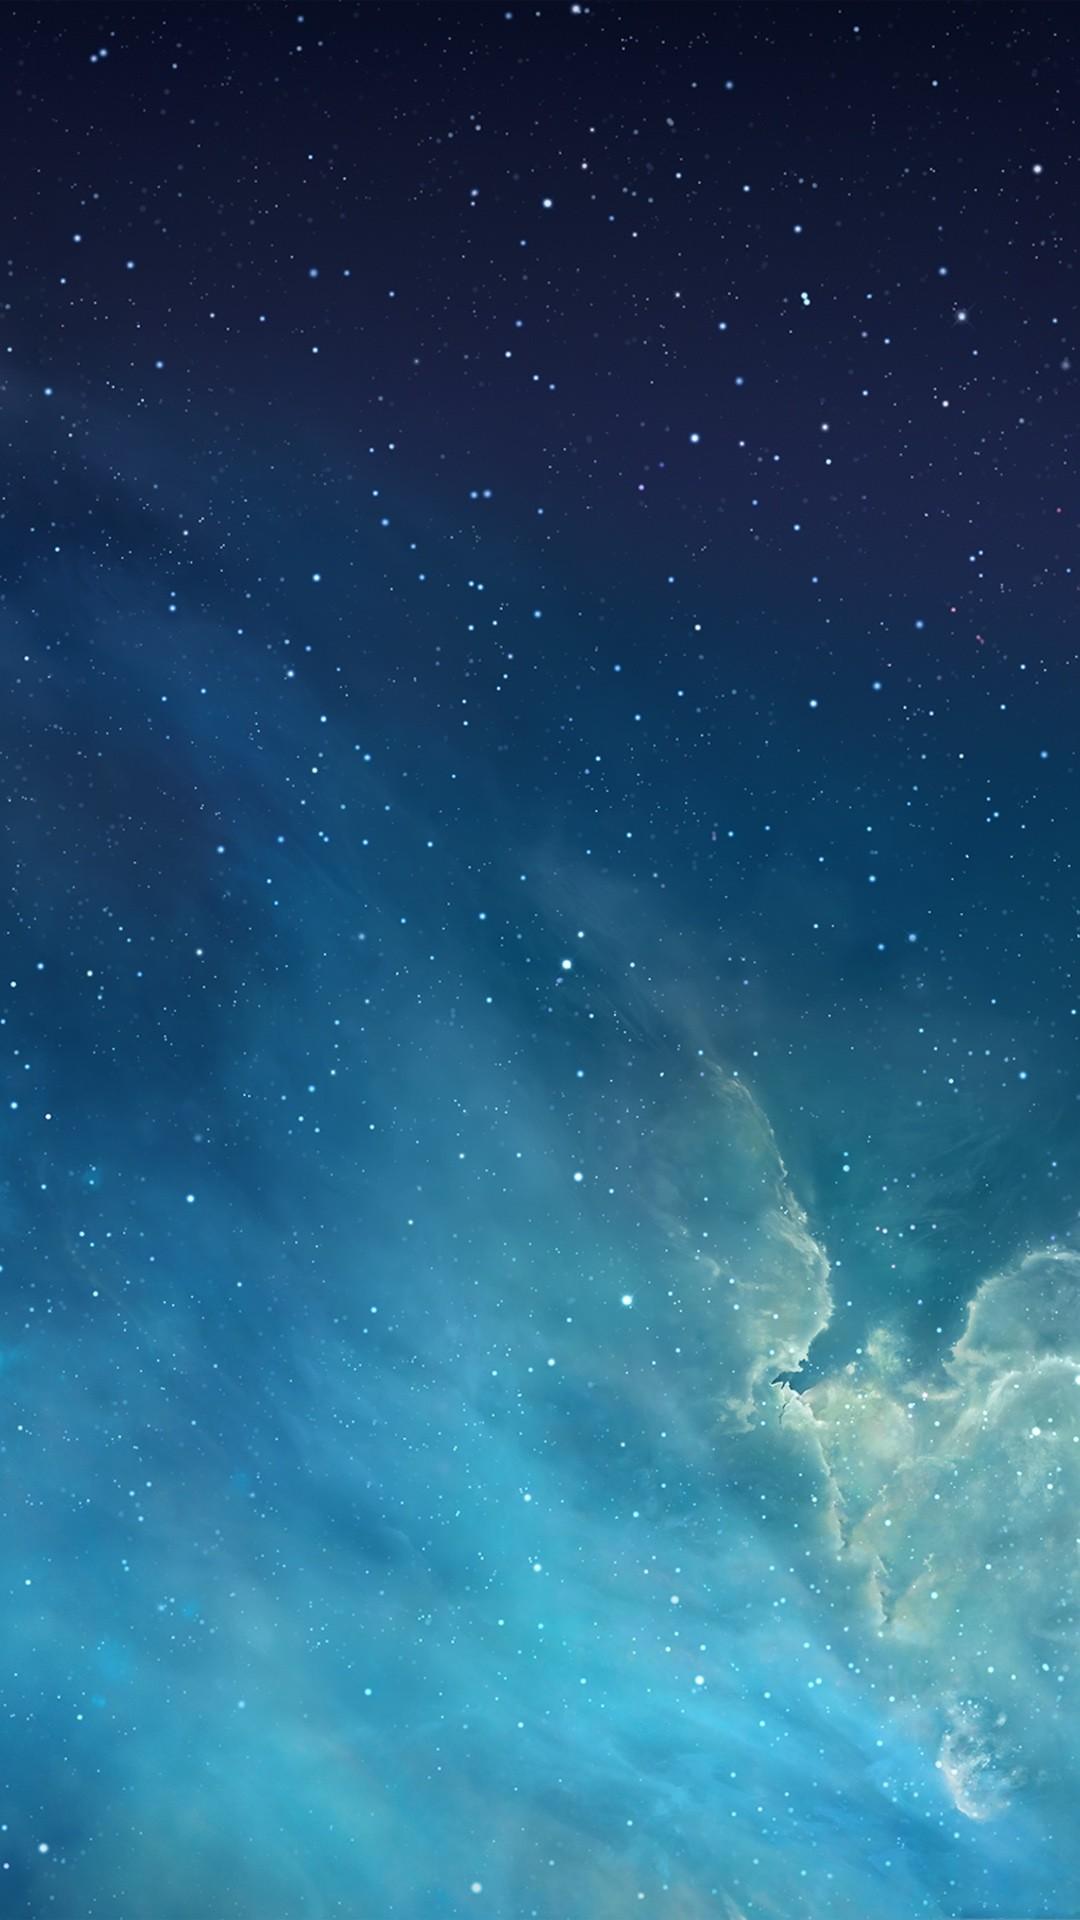 Apple iOS7 Default Lockscreen iPhone 6 Plus HD Wallpaper …